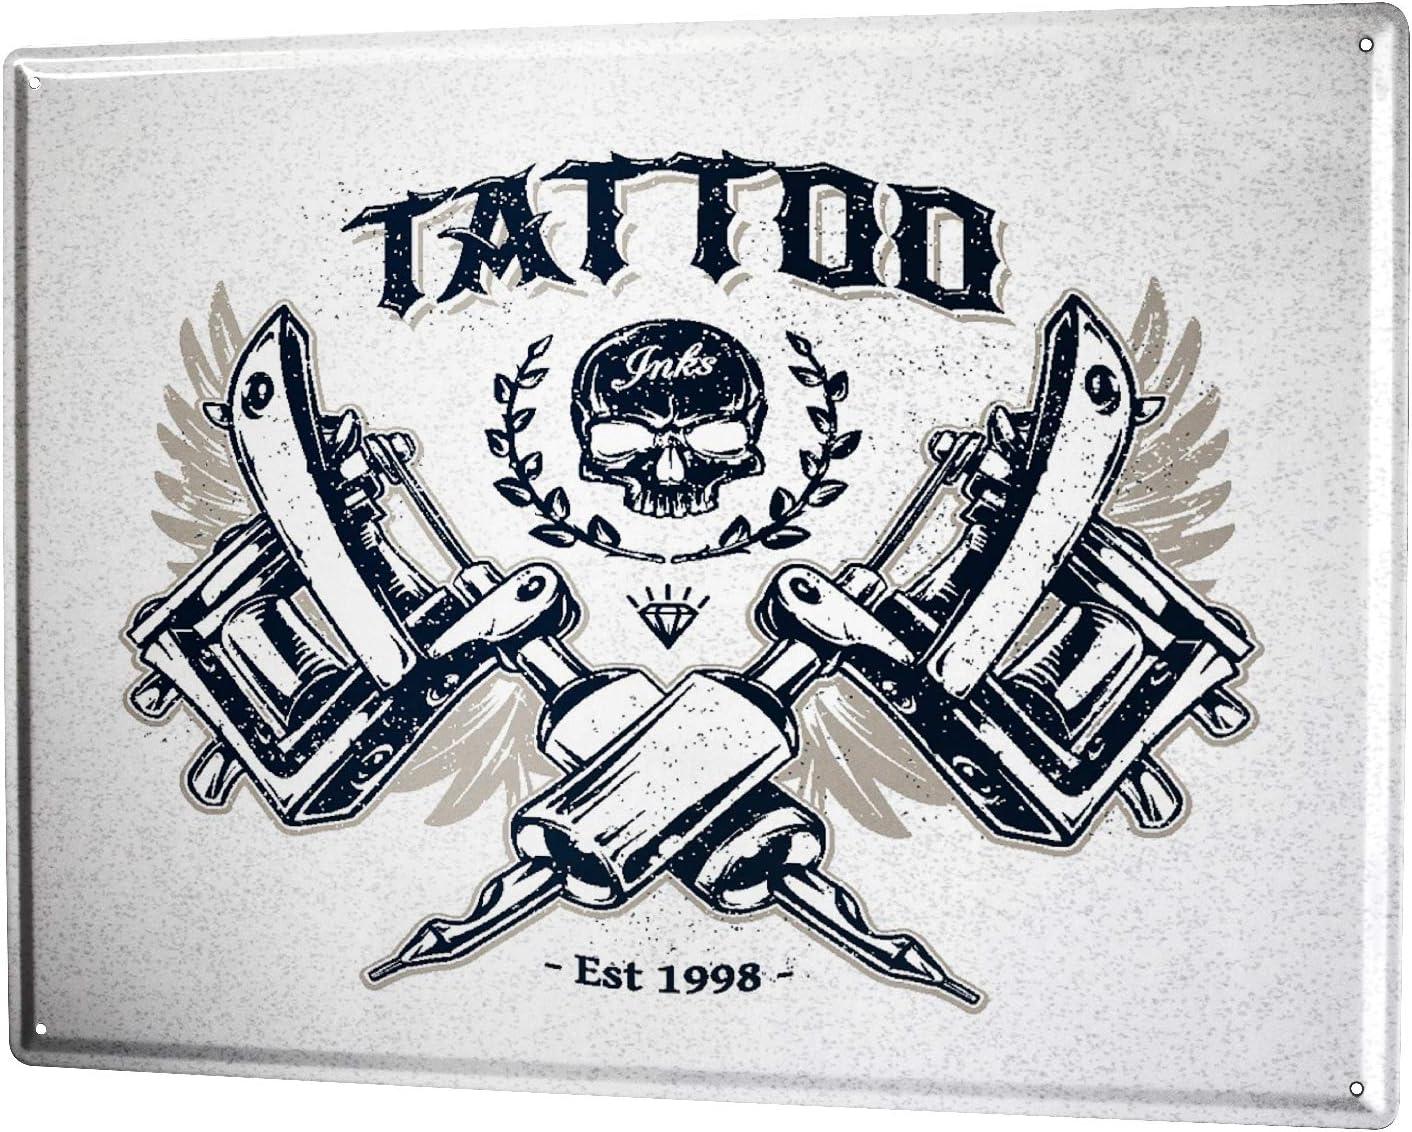 Metal Tin Sign all pain no gain tattoo Decor Pub Bar Home Vintage Retro